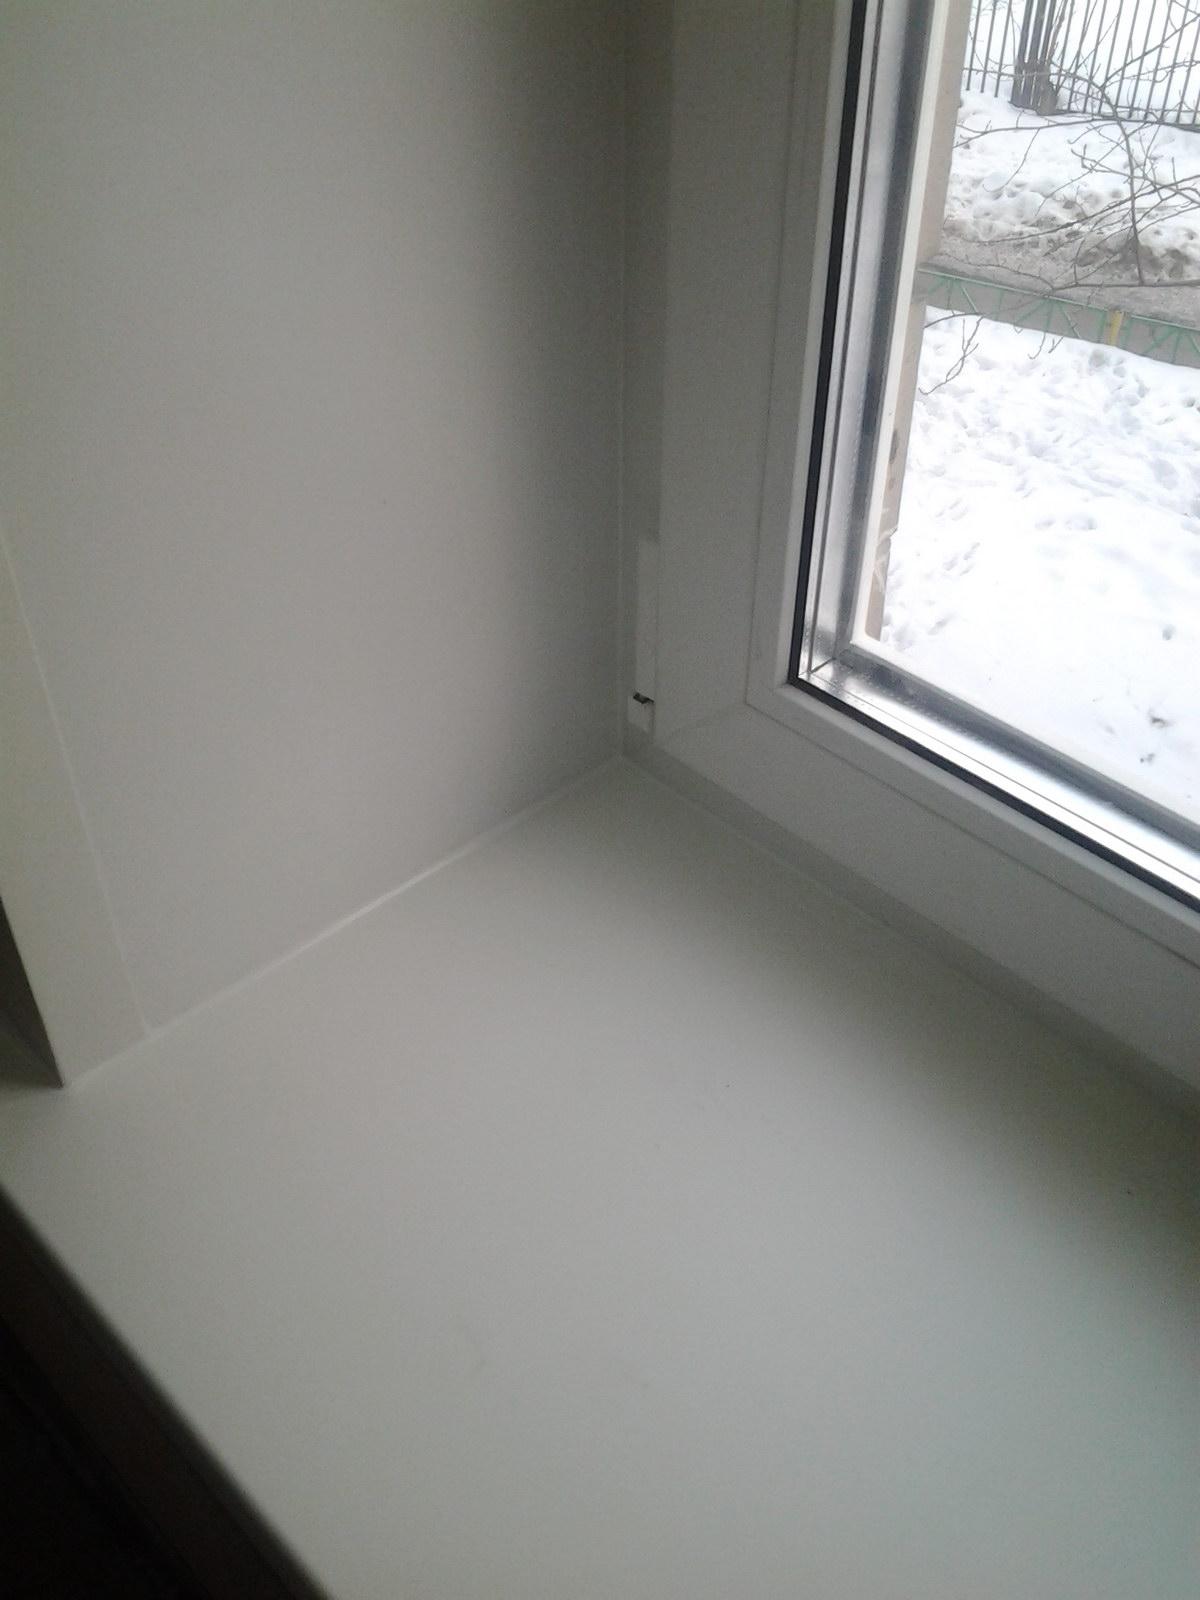 Промерзает стена в кухне